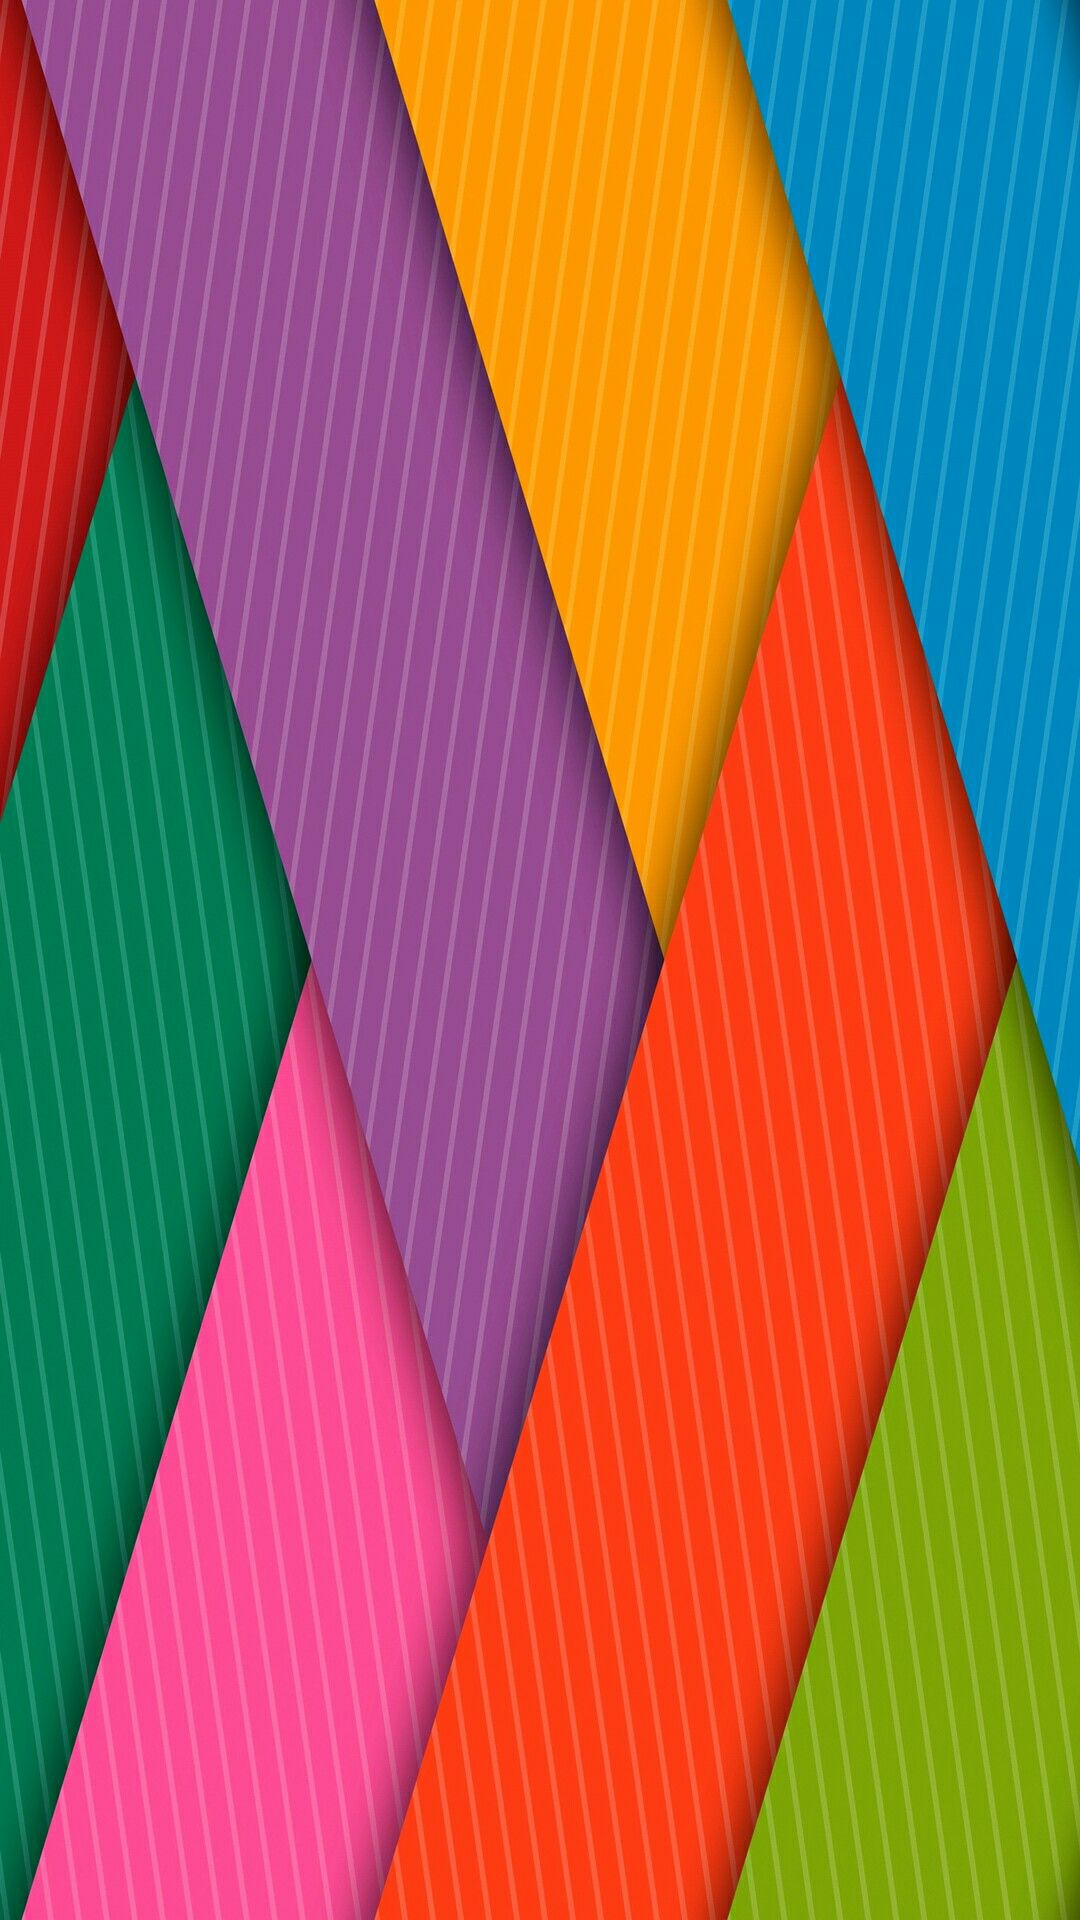 colors.quenalbertini: Rainbow Color iPhone Wallpaper | wallpapers in 2019 | Qhd wallpaper ...